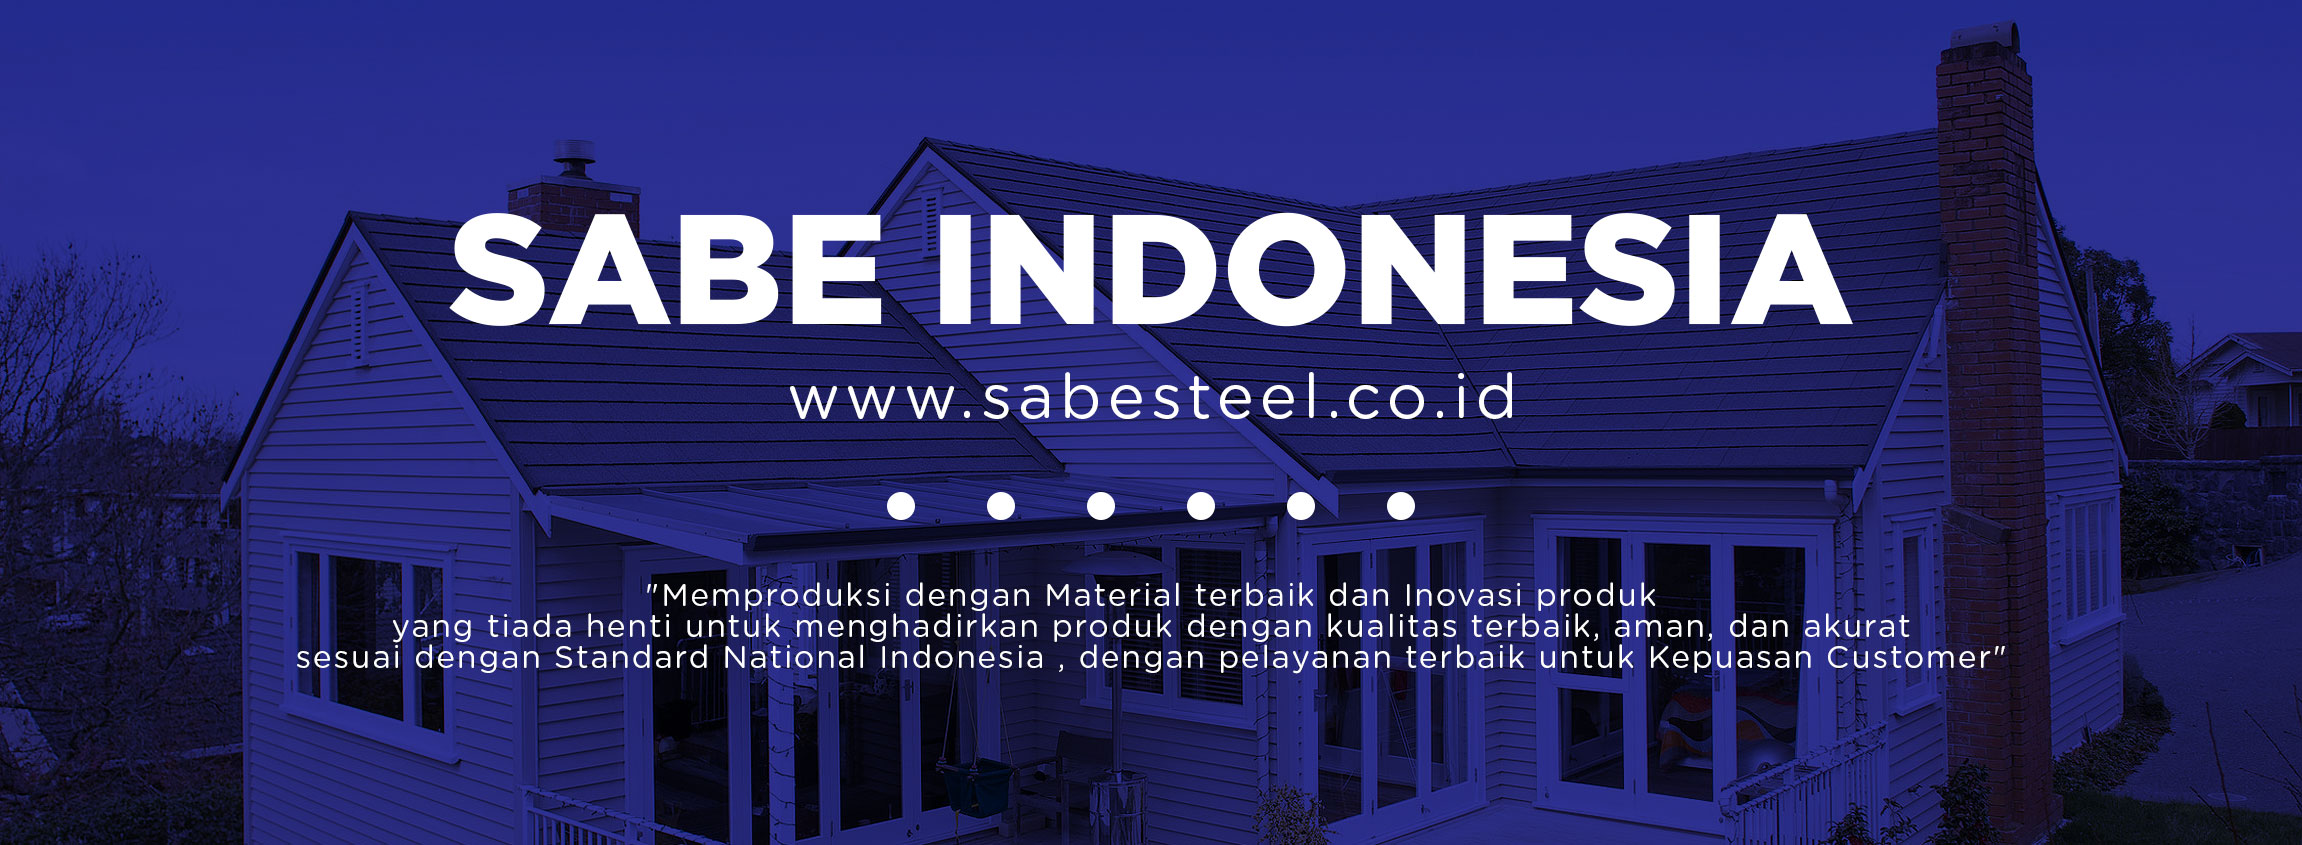 Pt Sabe Indonesia Jual Genteng Metal Harga Murah